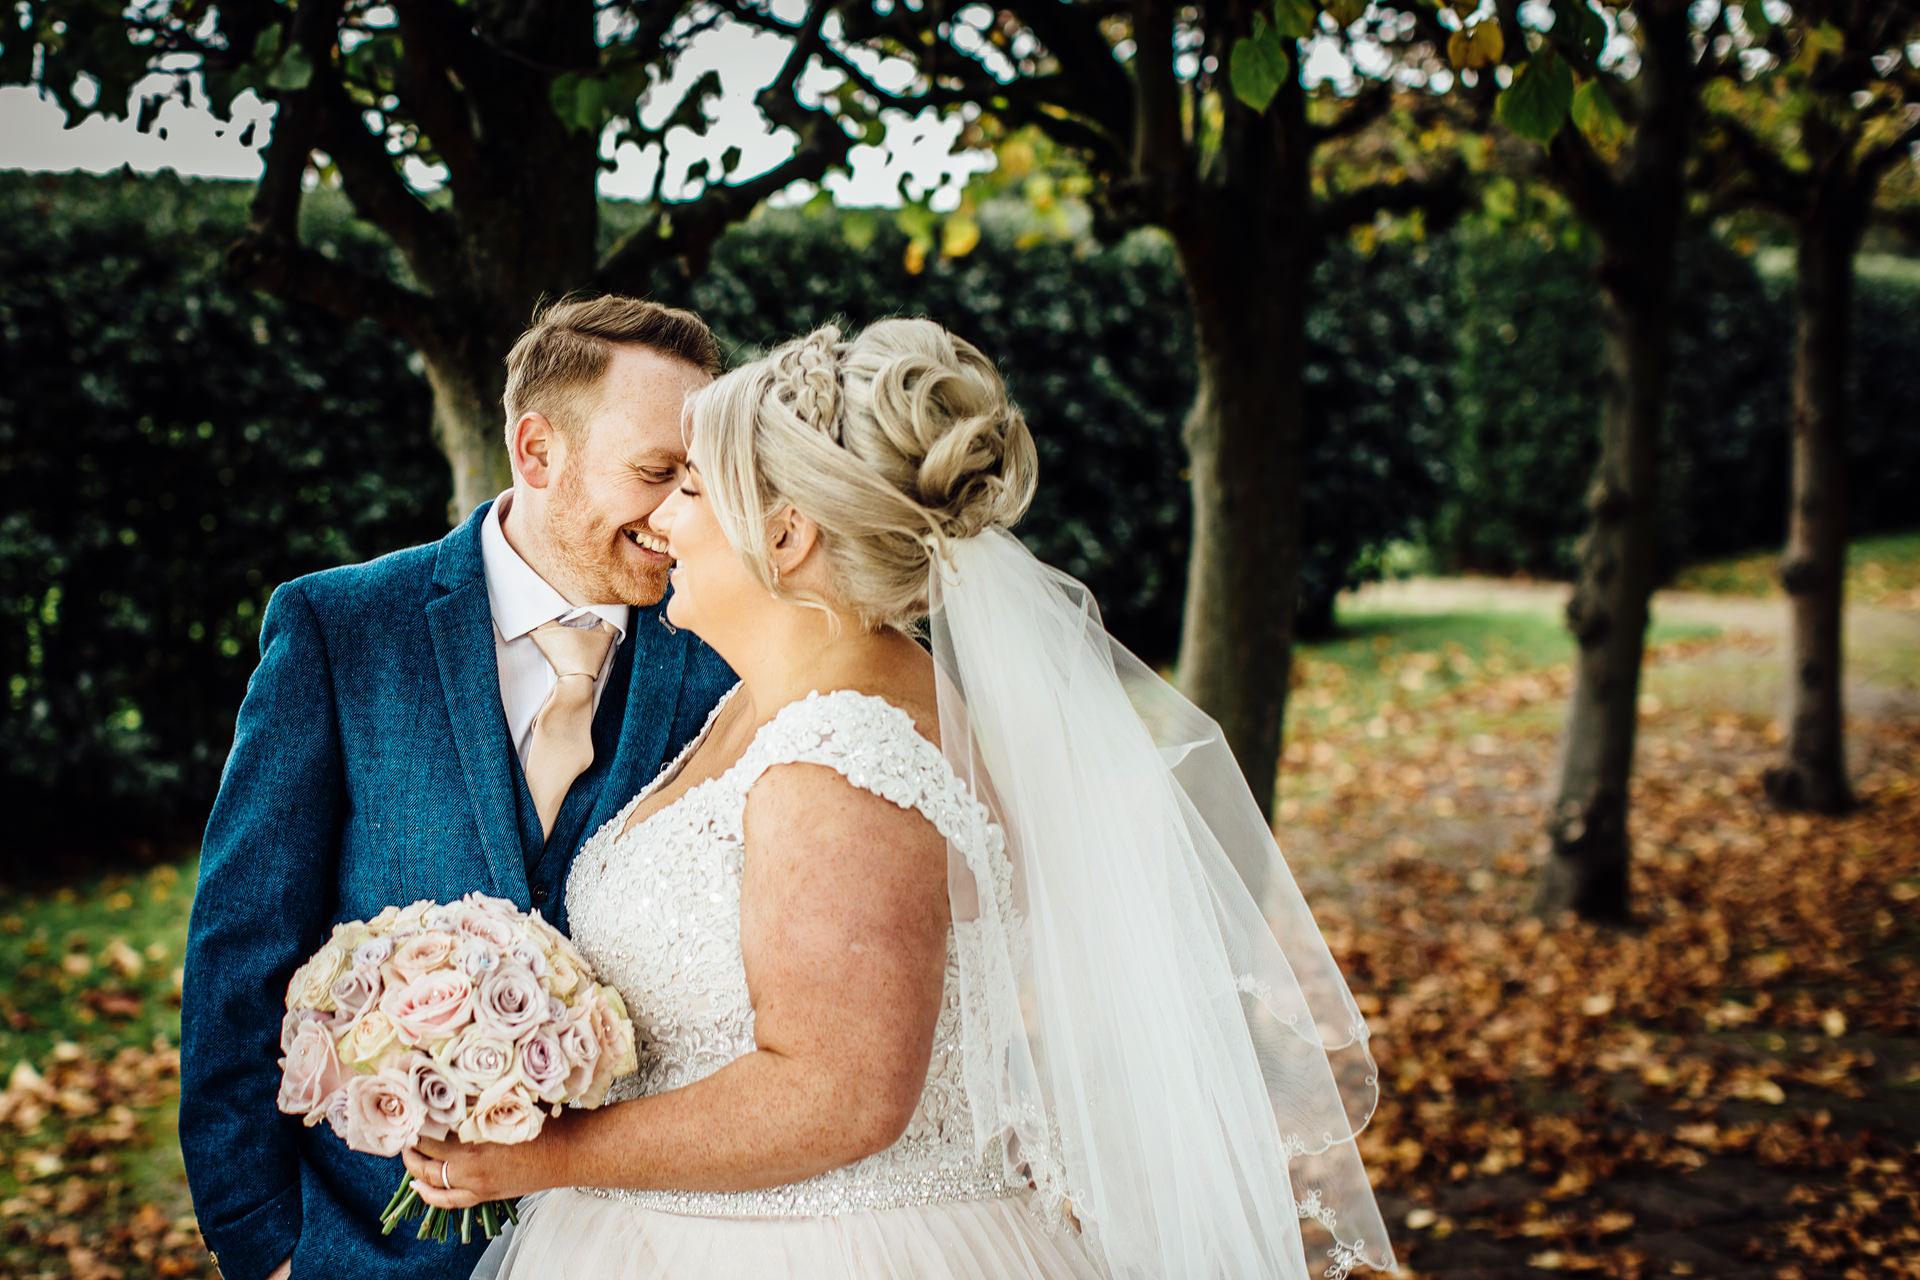 wedding photographer touching noses thornton manor gardens, cheshire